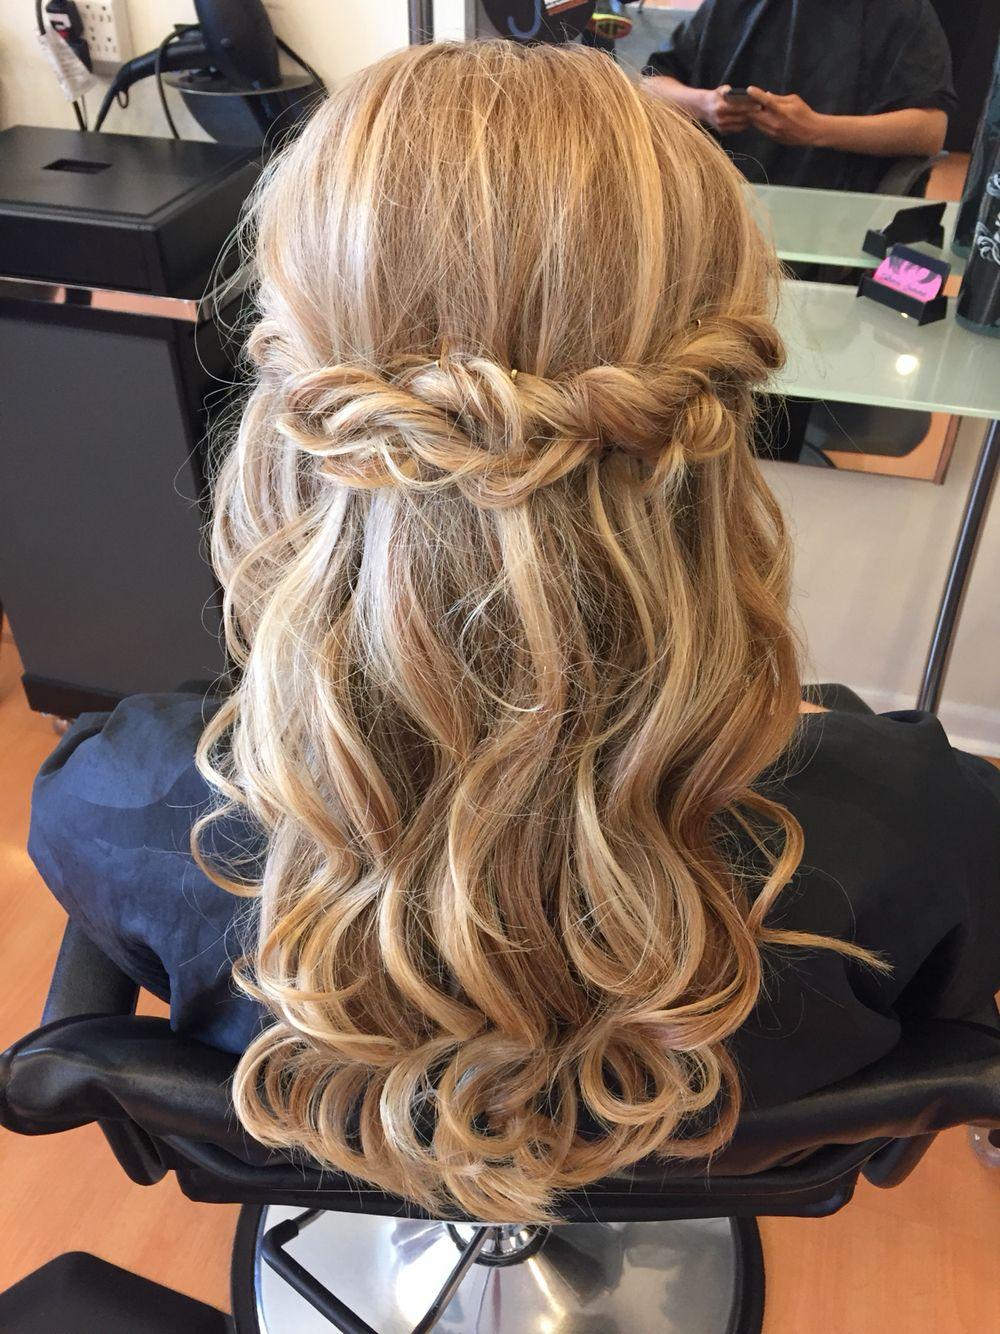 Twisted half updo | Cute hairstyles, Hair styles, Long hair styles